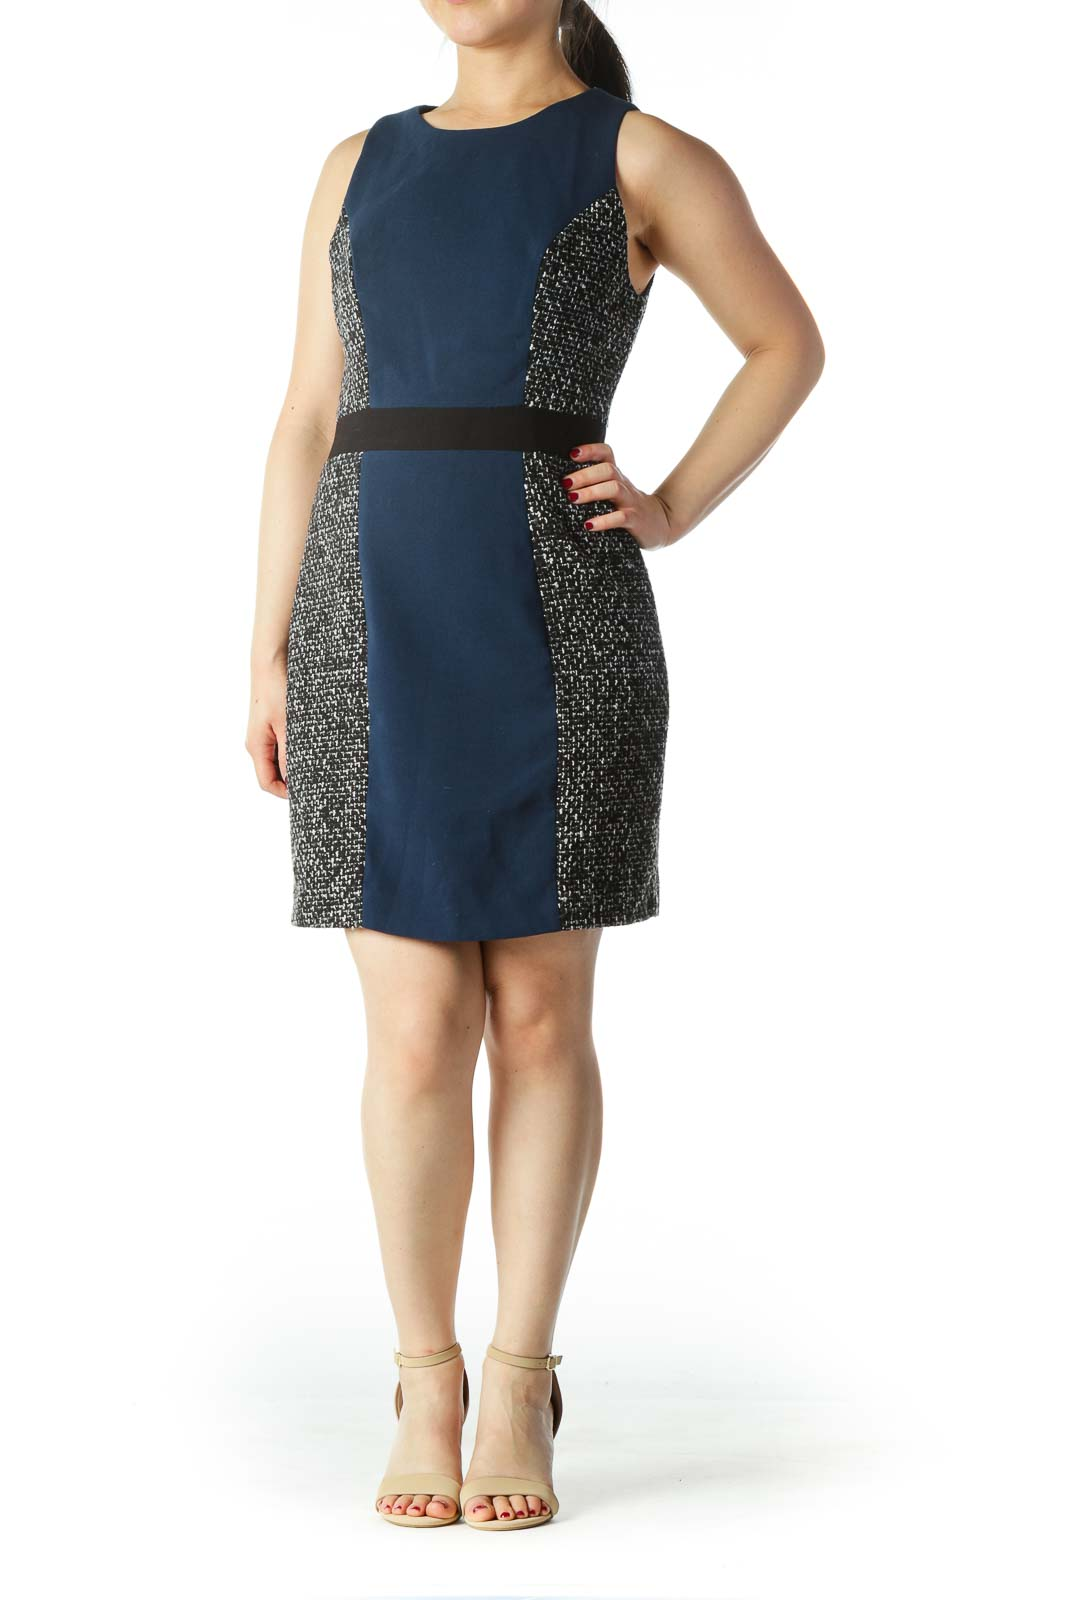 Blue Black White Knit Textured Work Dress